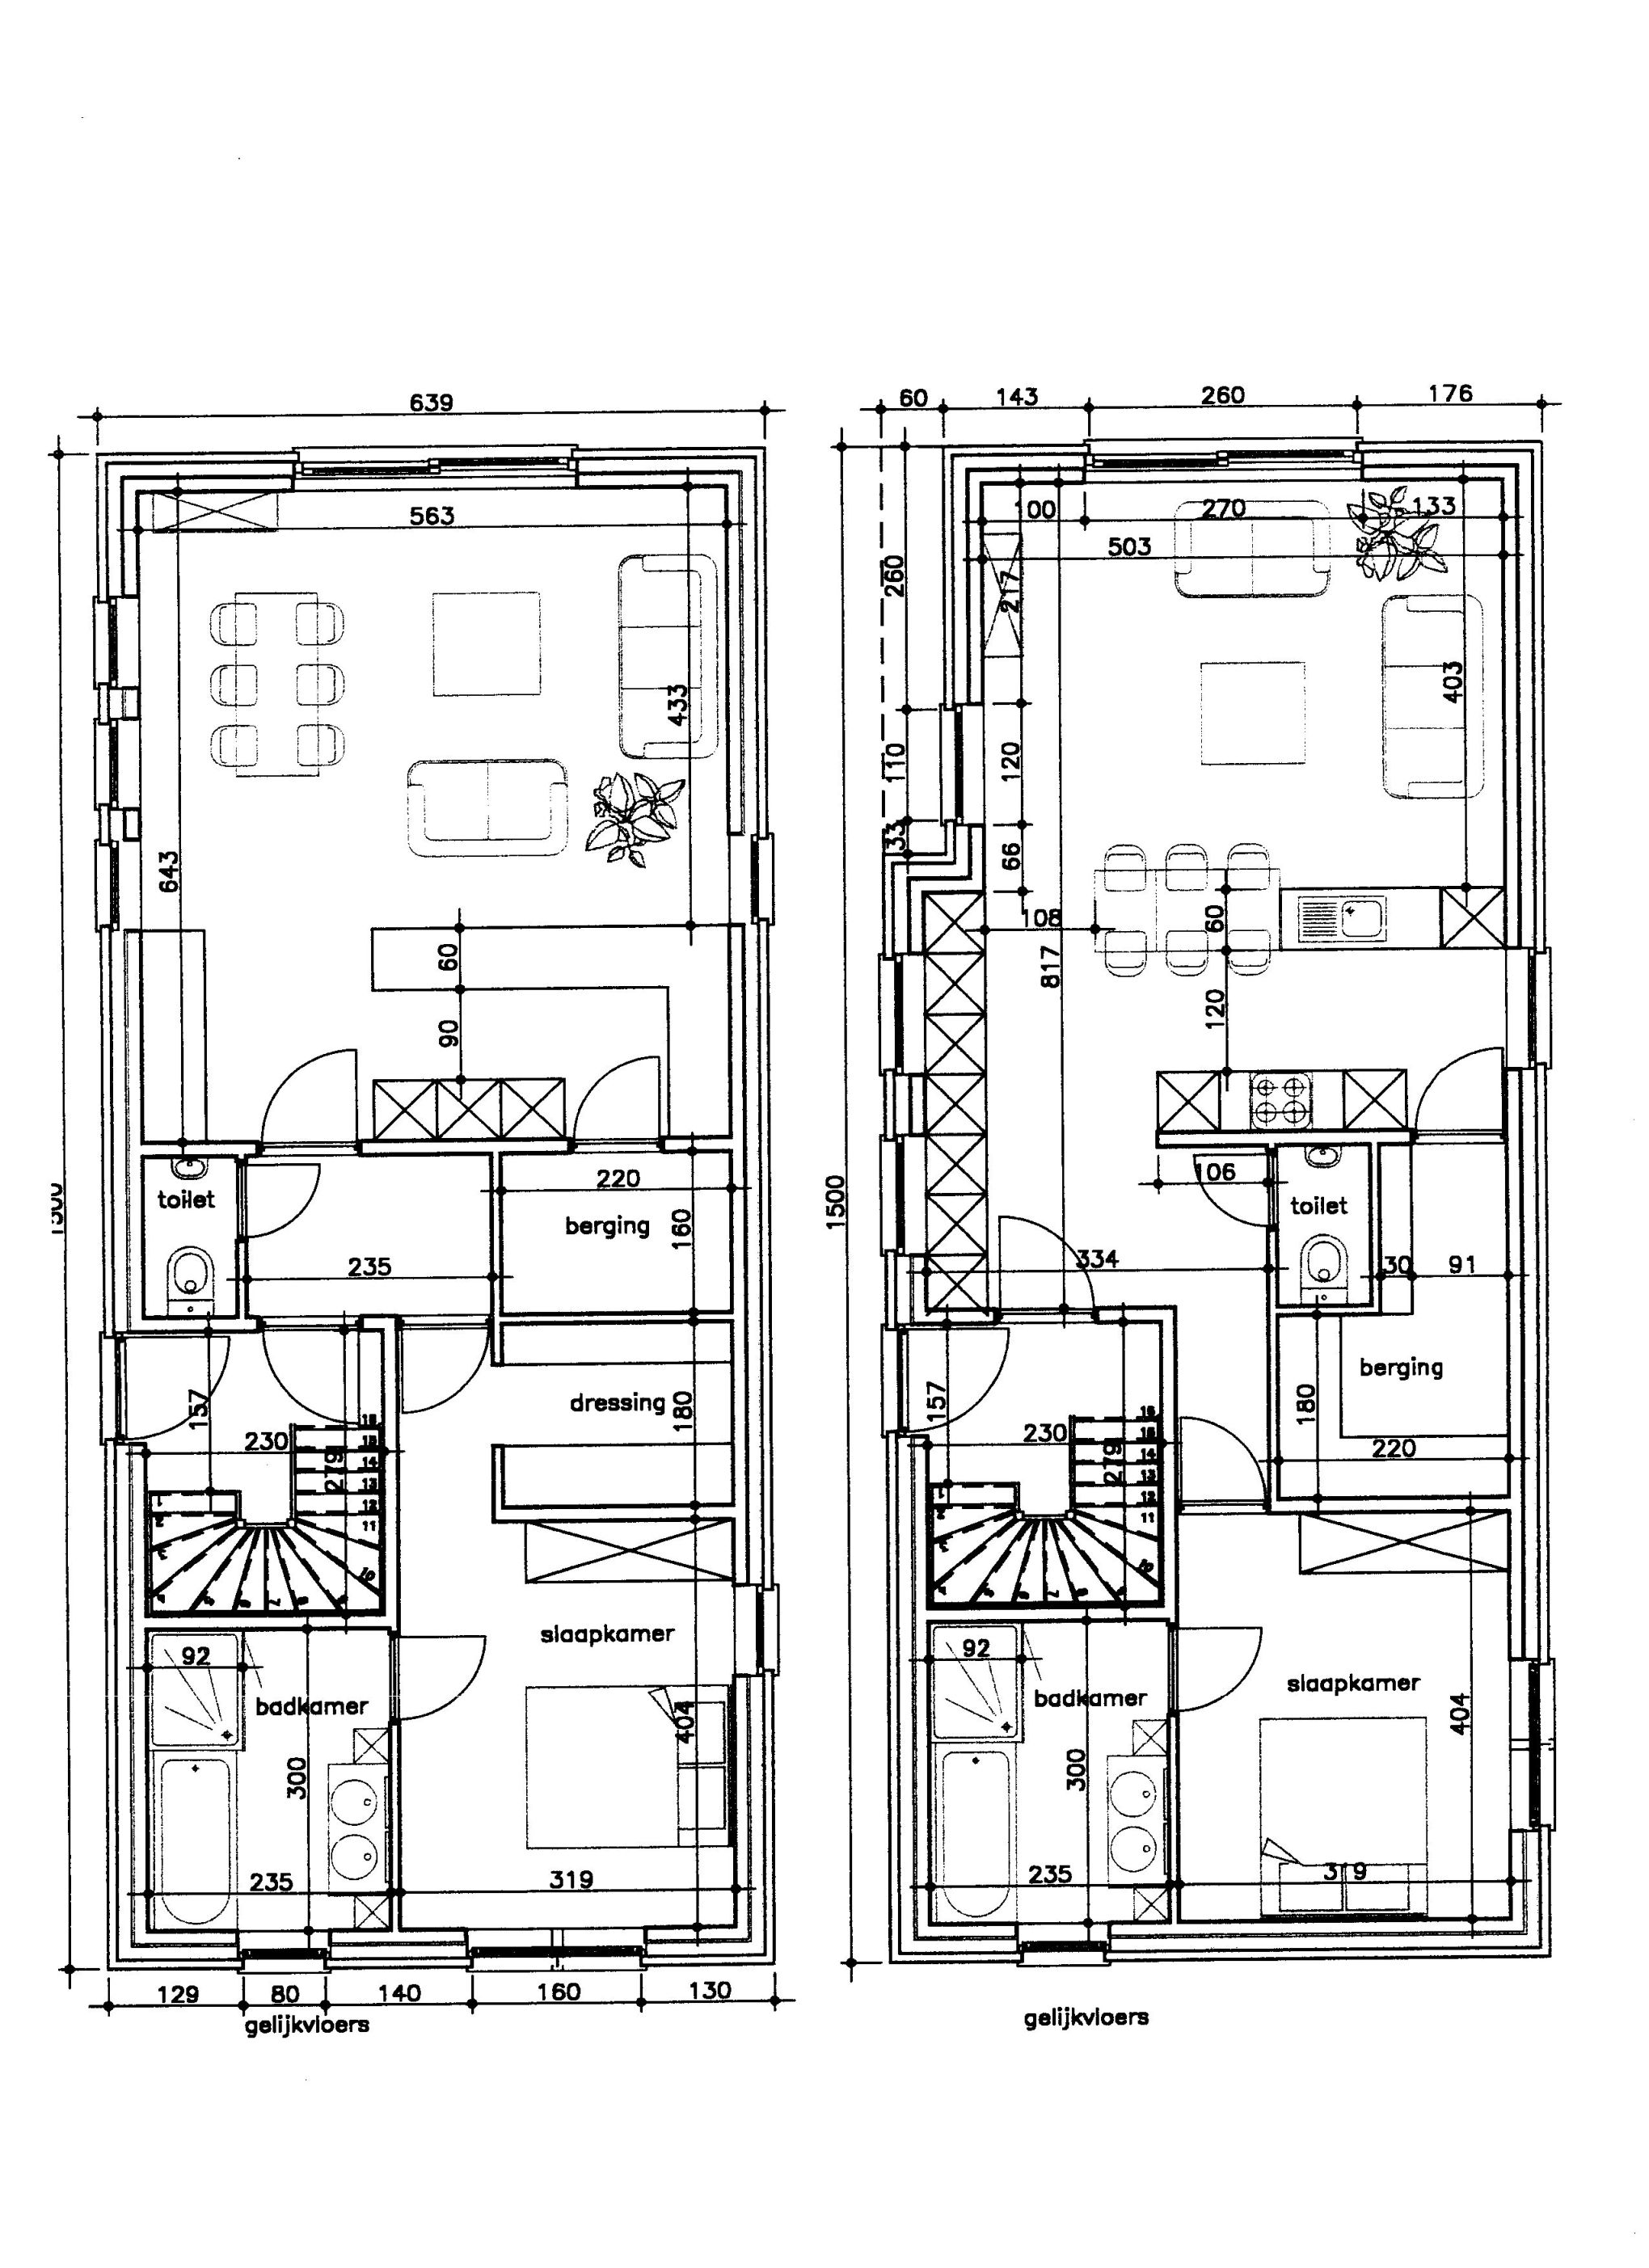 Grondplan doehetbeterzelf for Grondplan badkamer